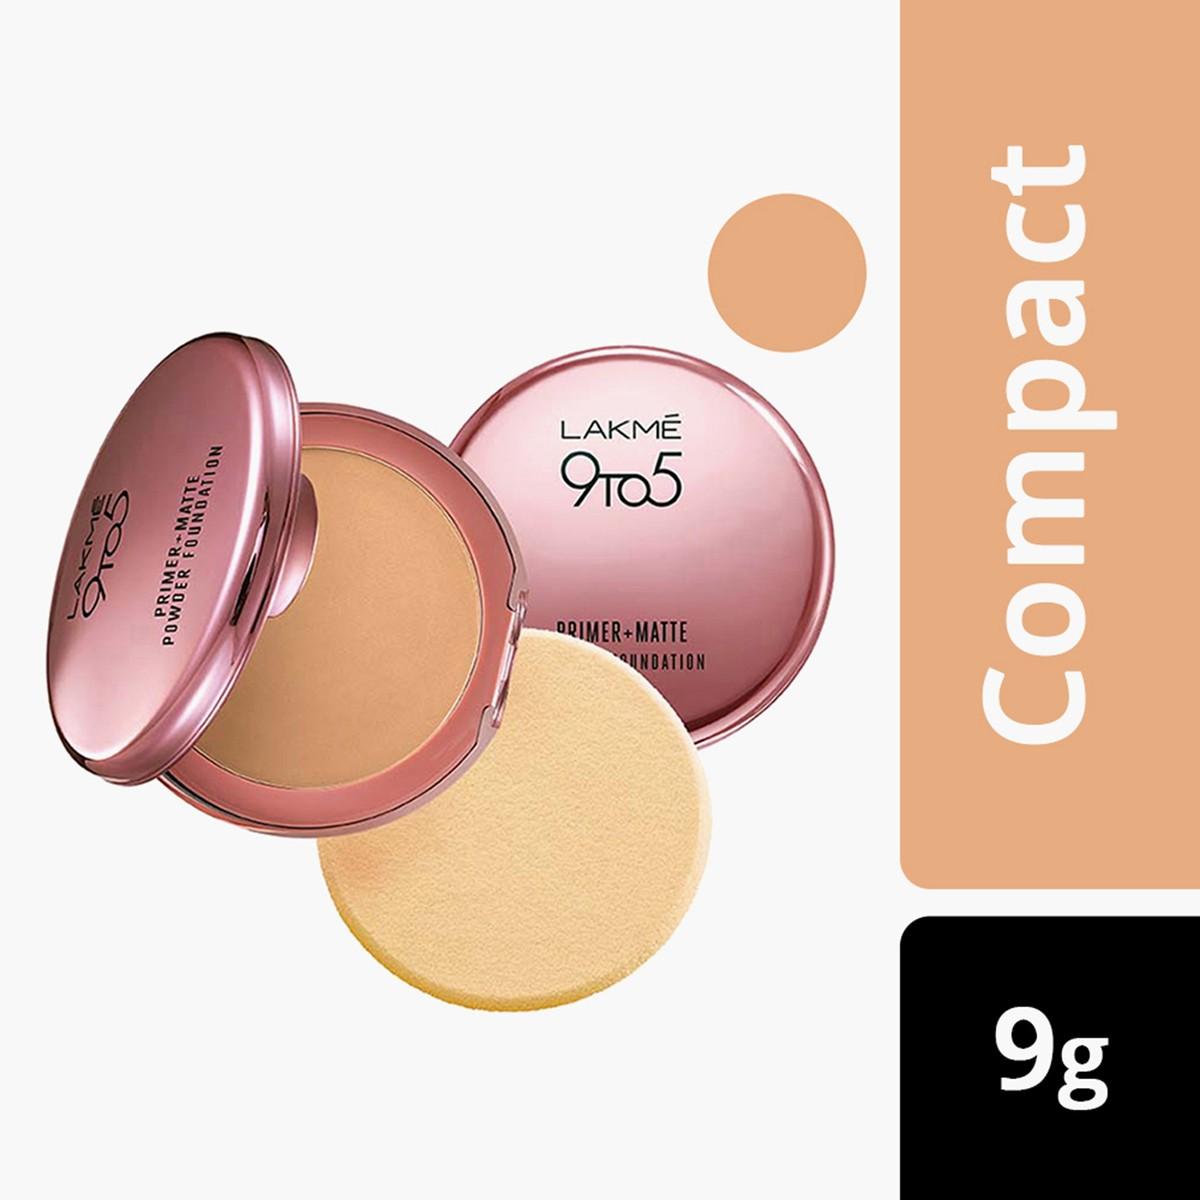 Lakme Compact Powder - 9g